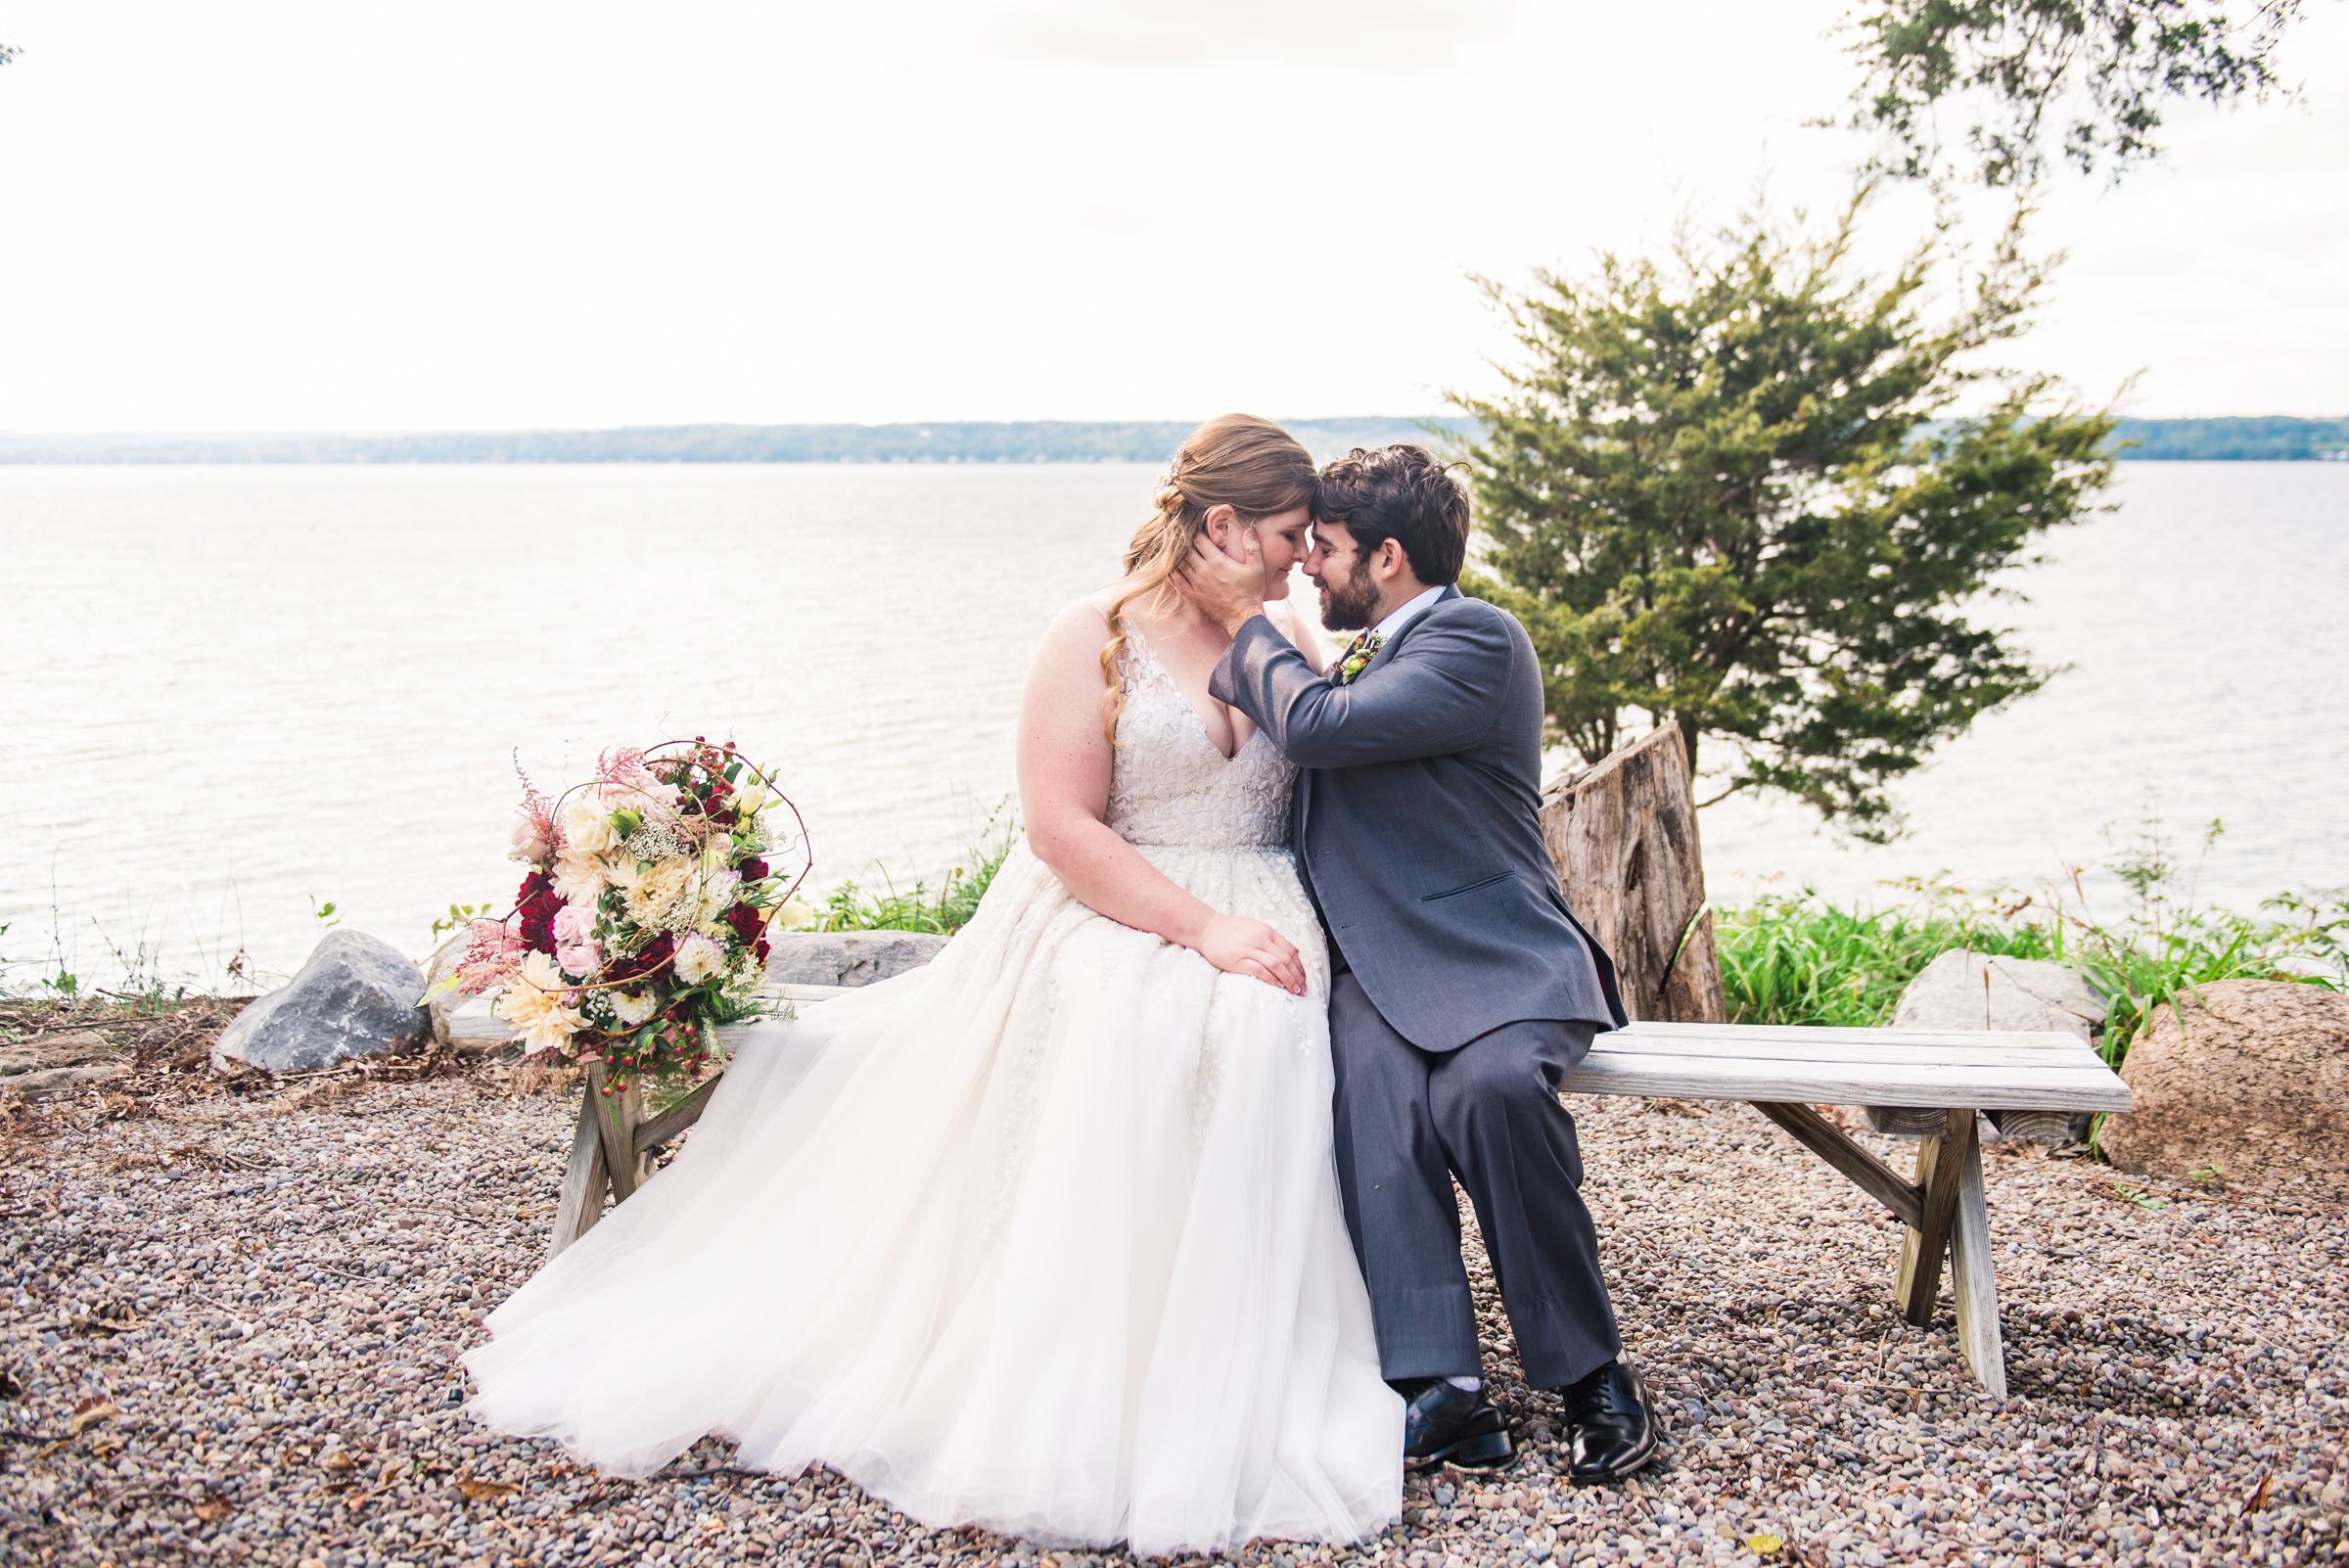 Zugibe_Vineyards_Finger_Lakes_Wedding_JILL_STUDIO_Rochester_NY_Photographer_DSC_3510.jpg